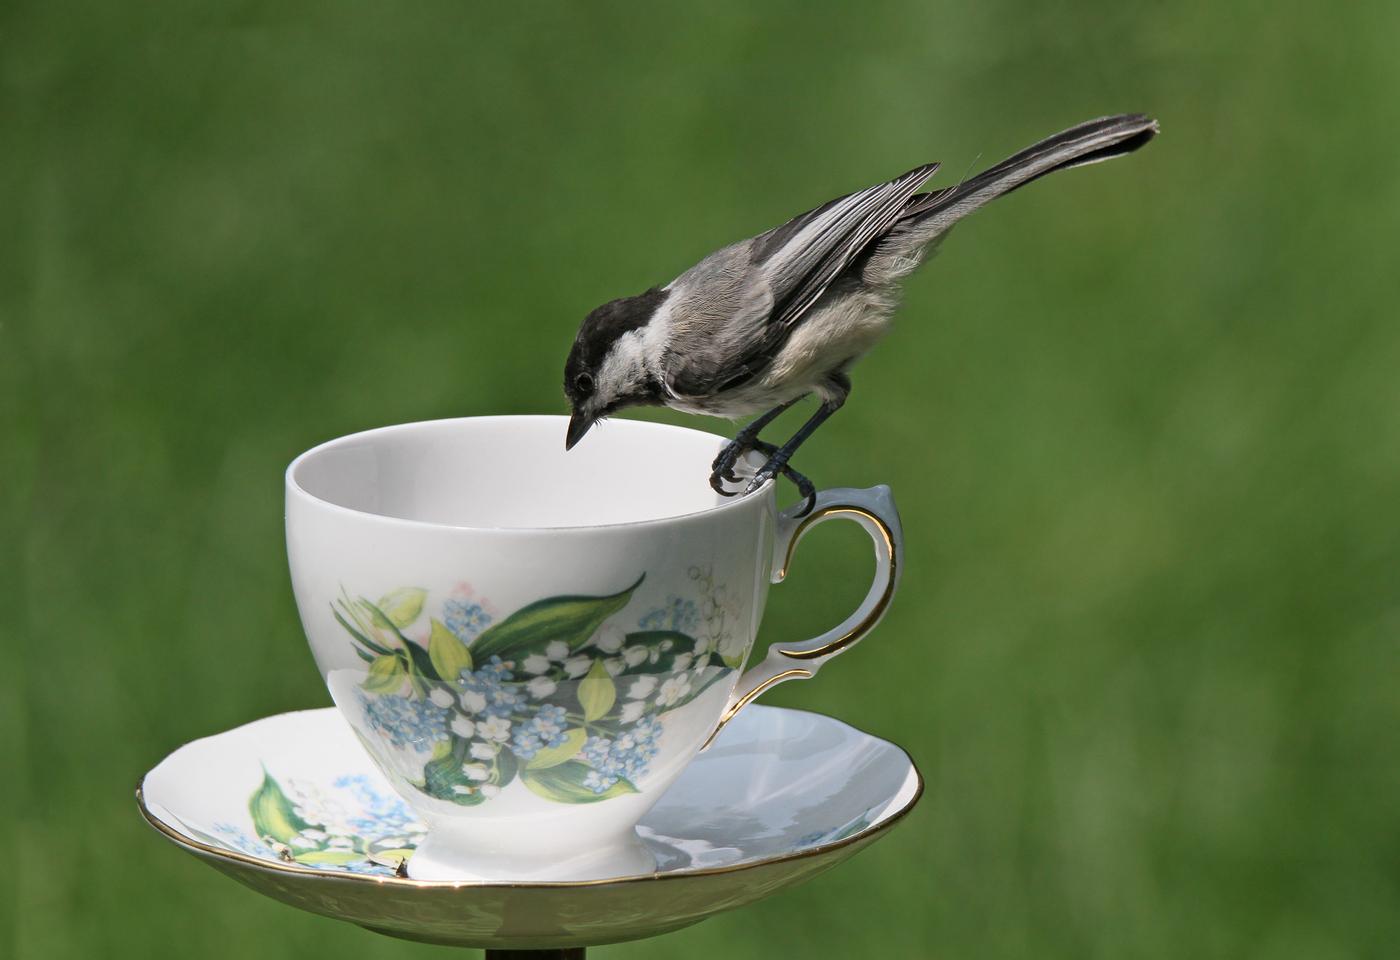 Chickadee at Teacup #31